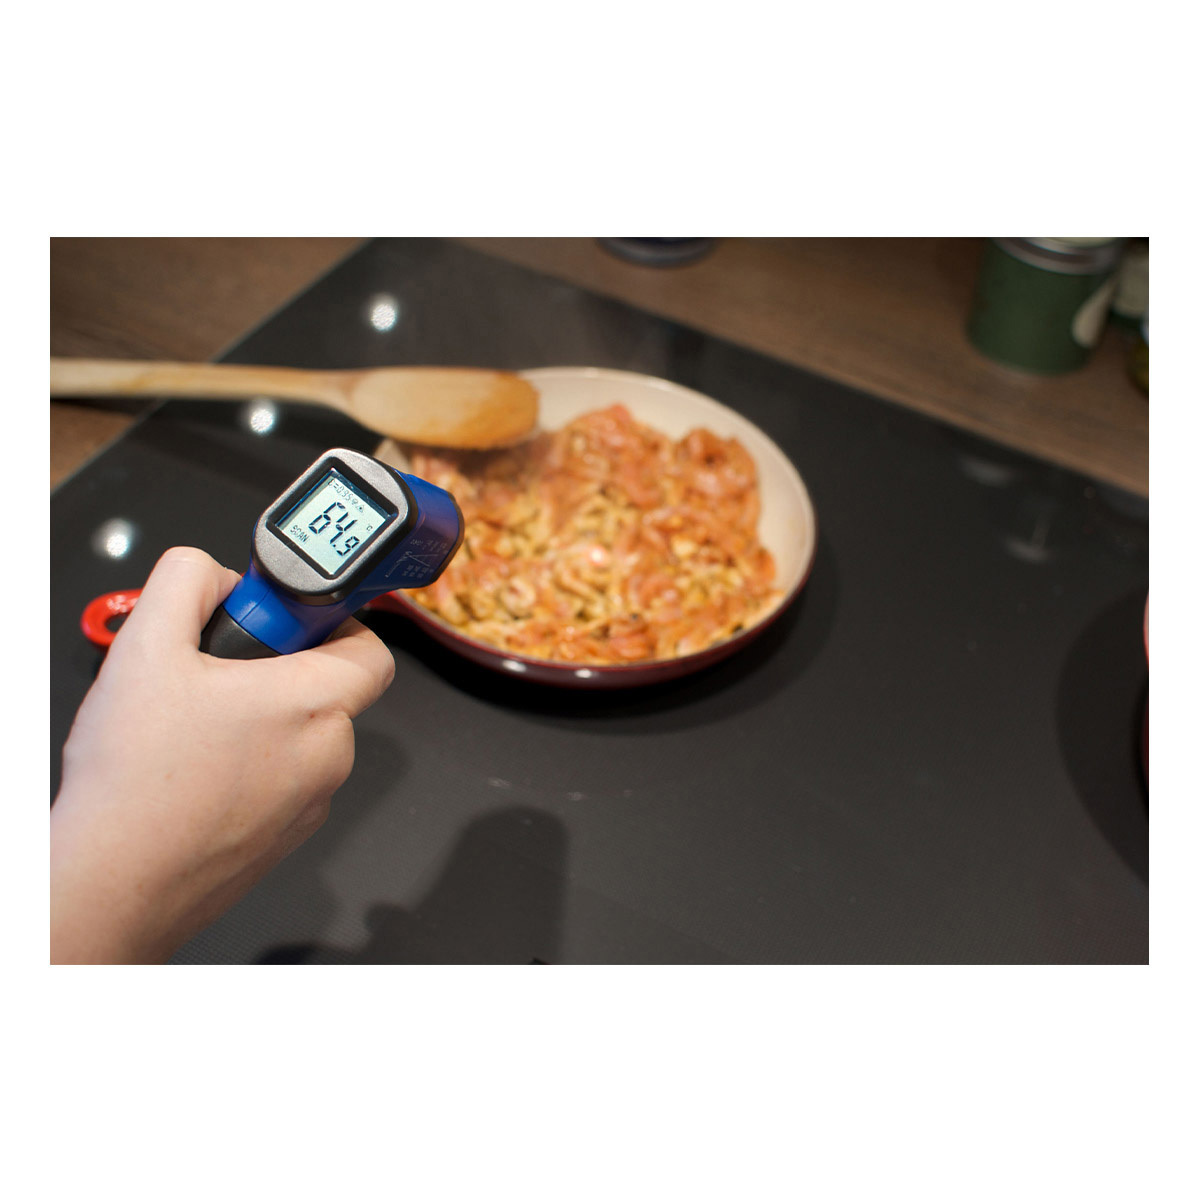 31-1134-06-infrarot-thermometer-scantemp-330-anwendung2-1200x1200px.jpg